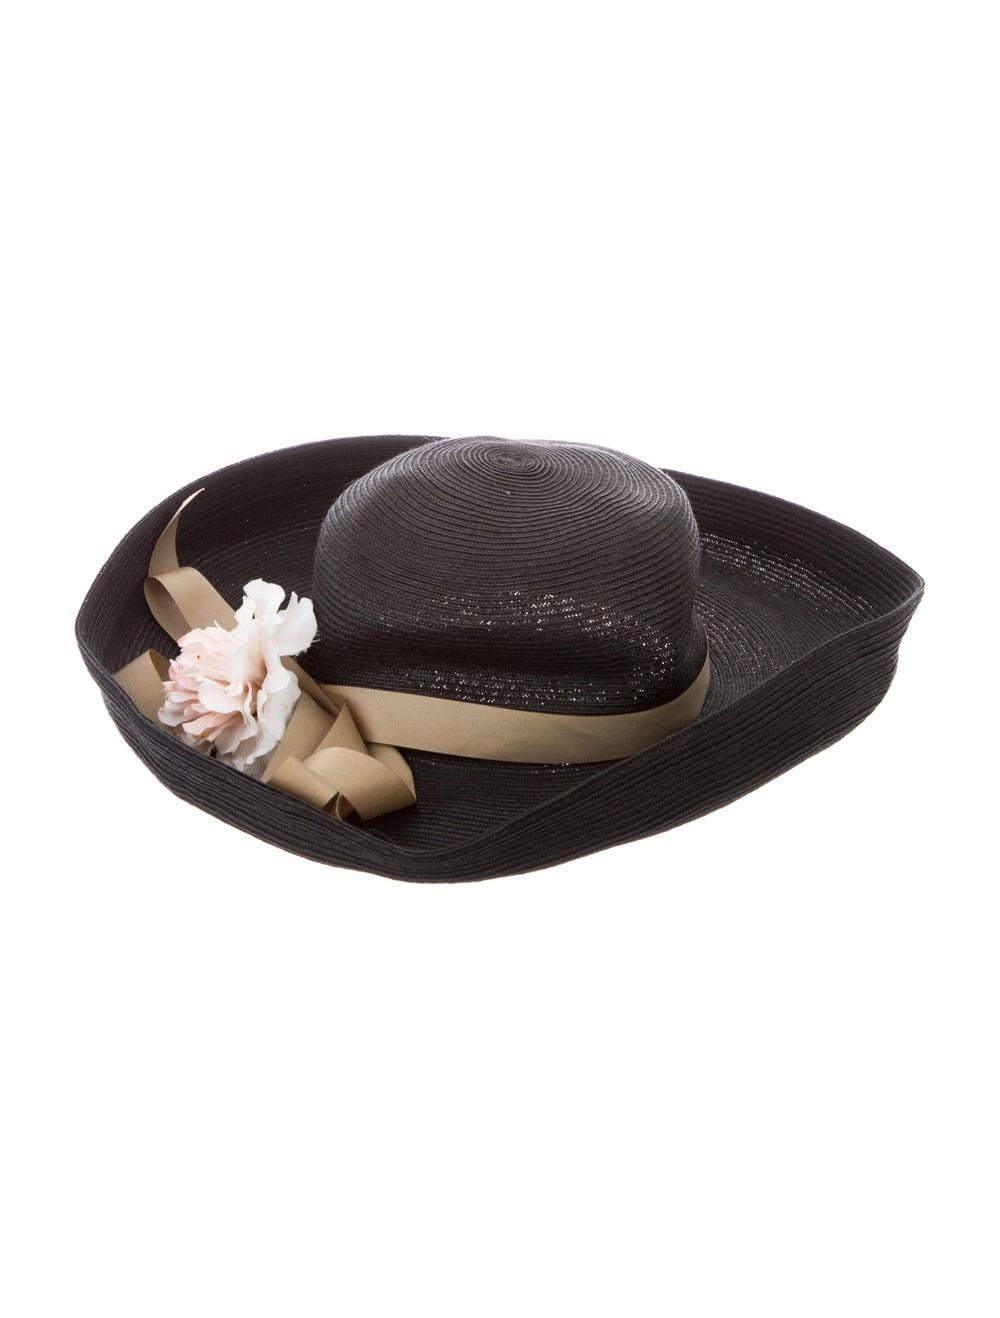 Eric Javits Straw Wide Brim Hat Grey - image 2